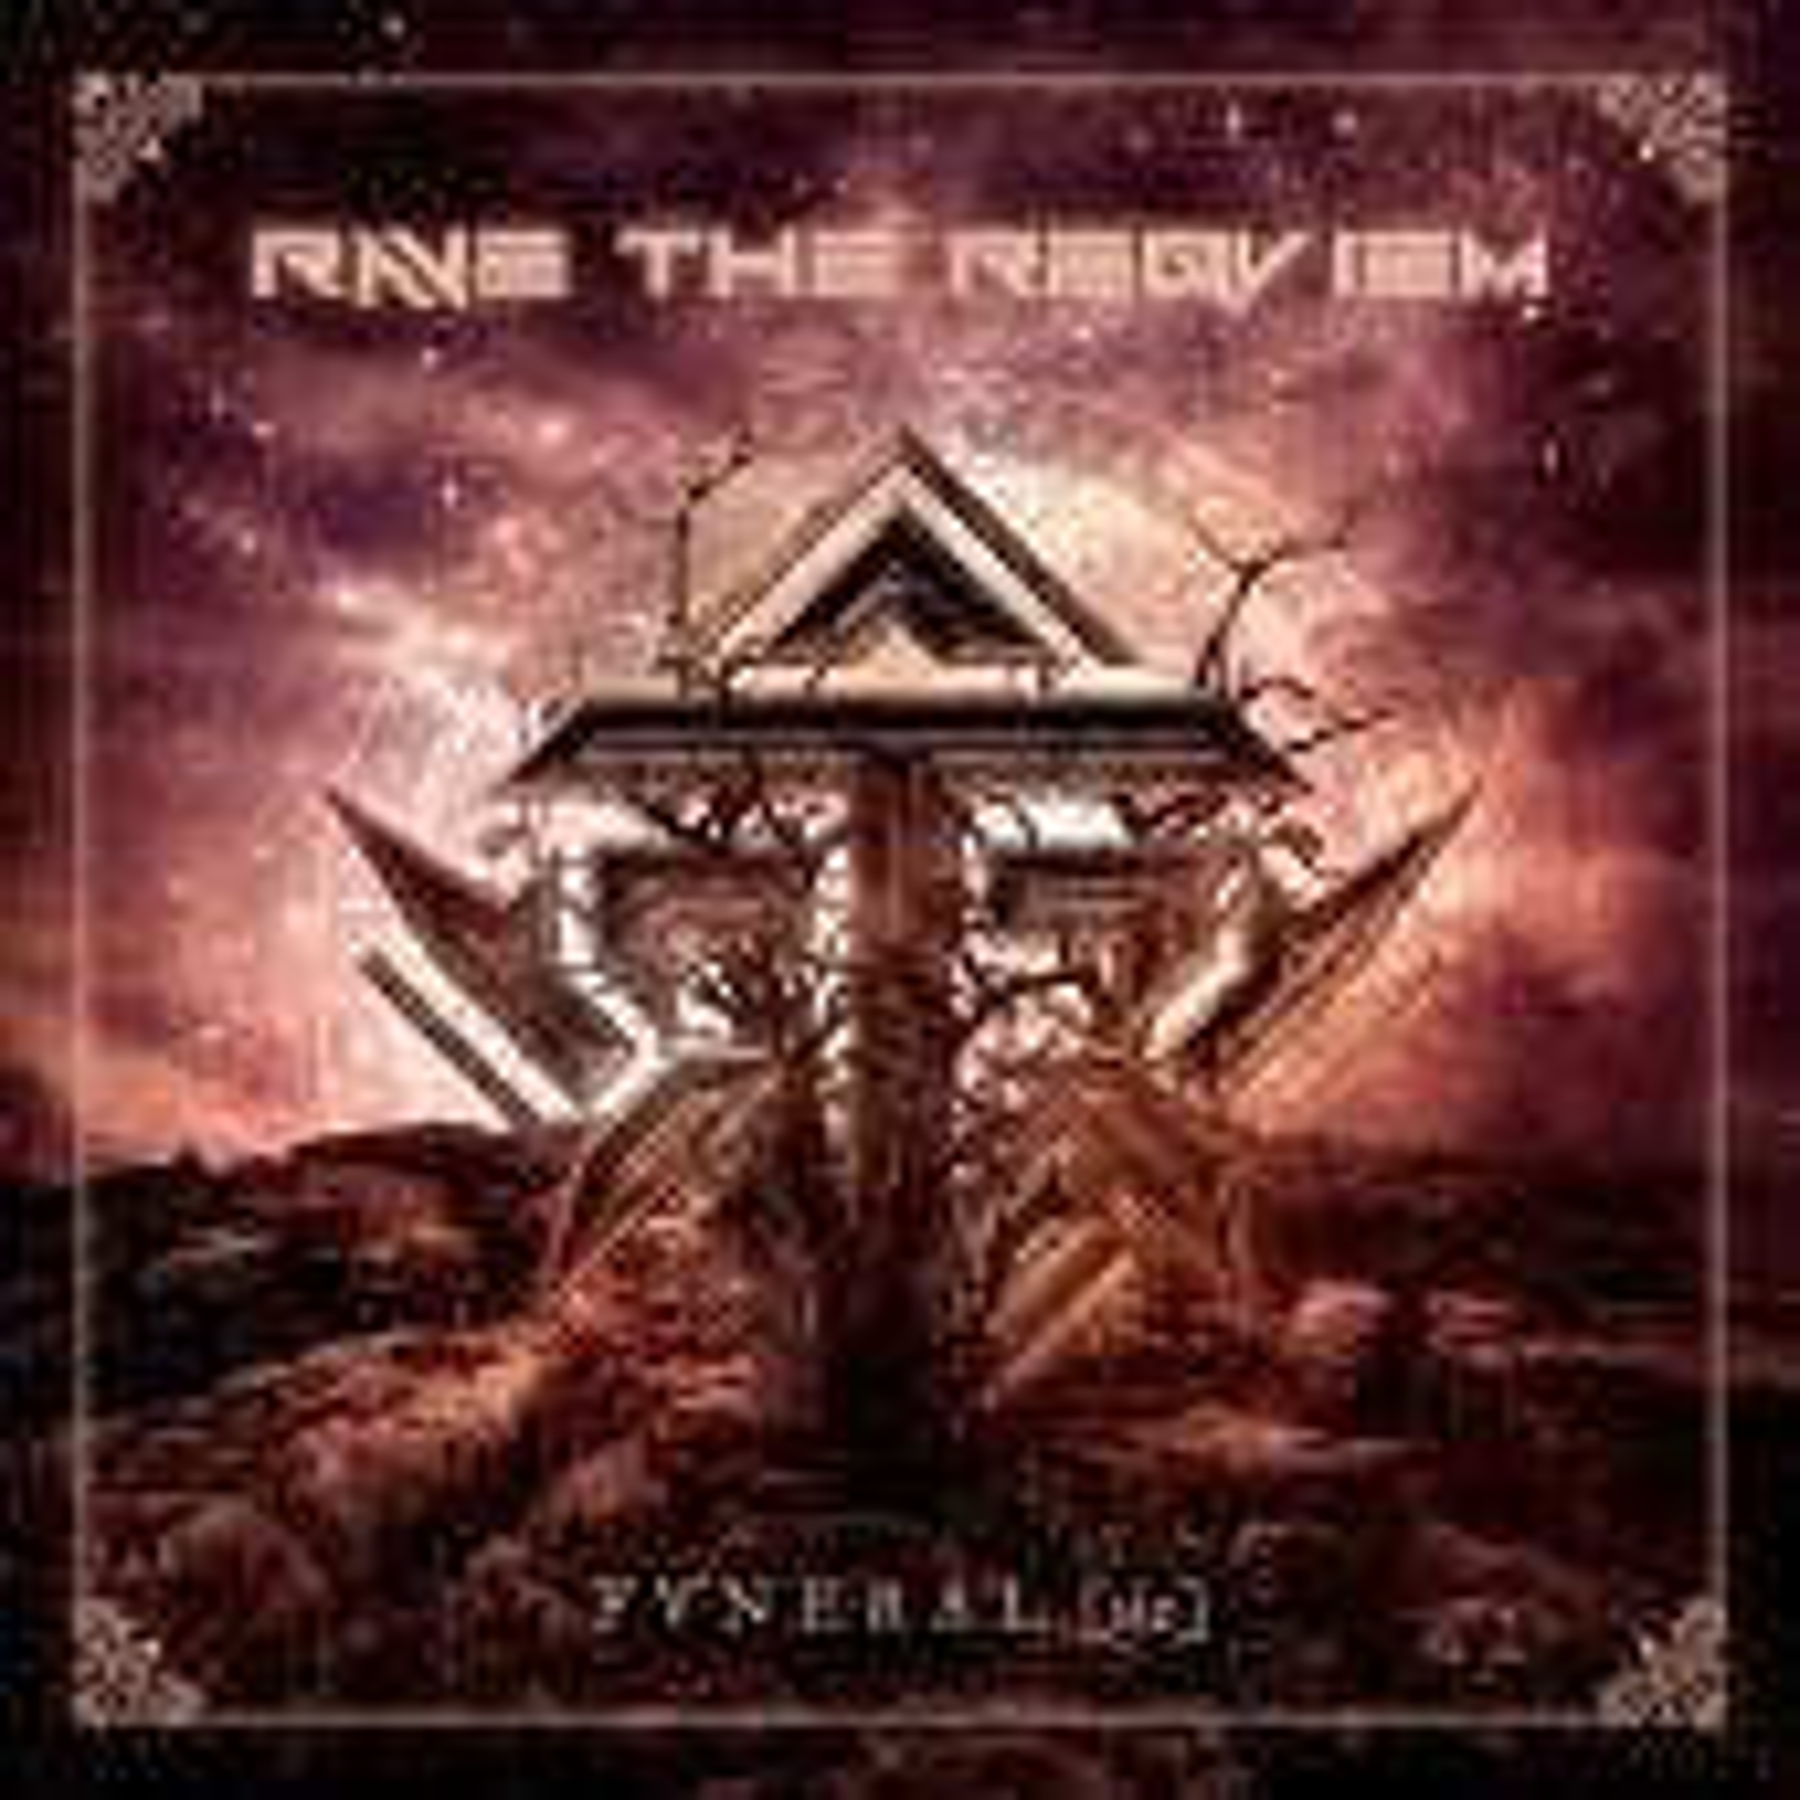 Rave The Reqviem - FVNERAL [sic] - CD